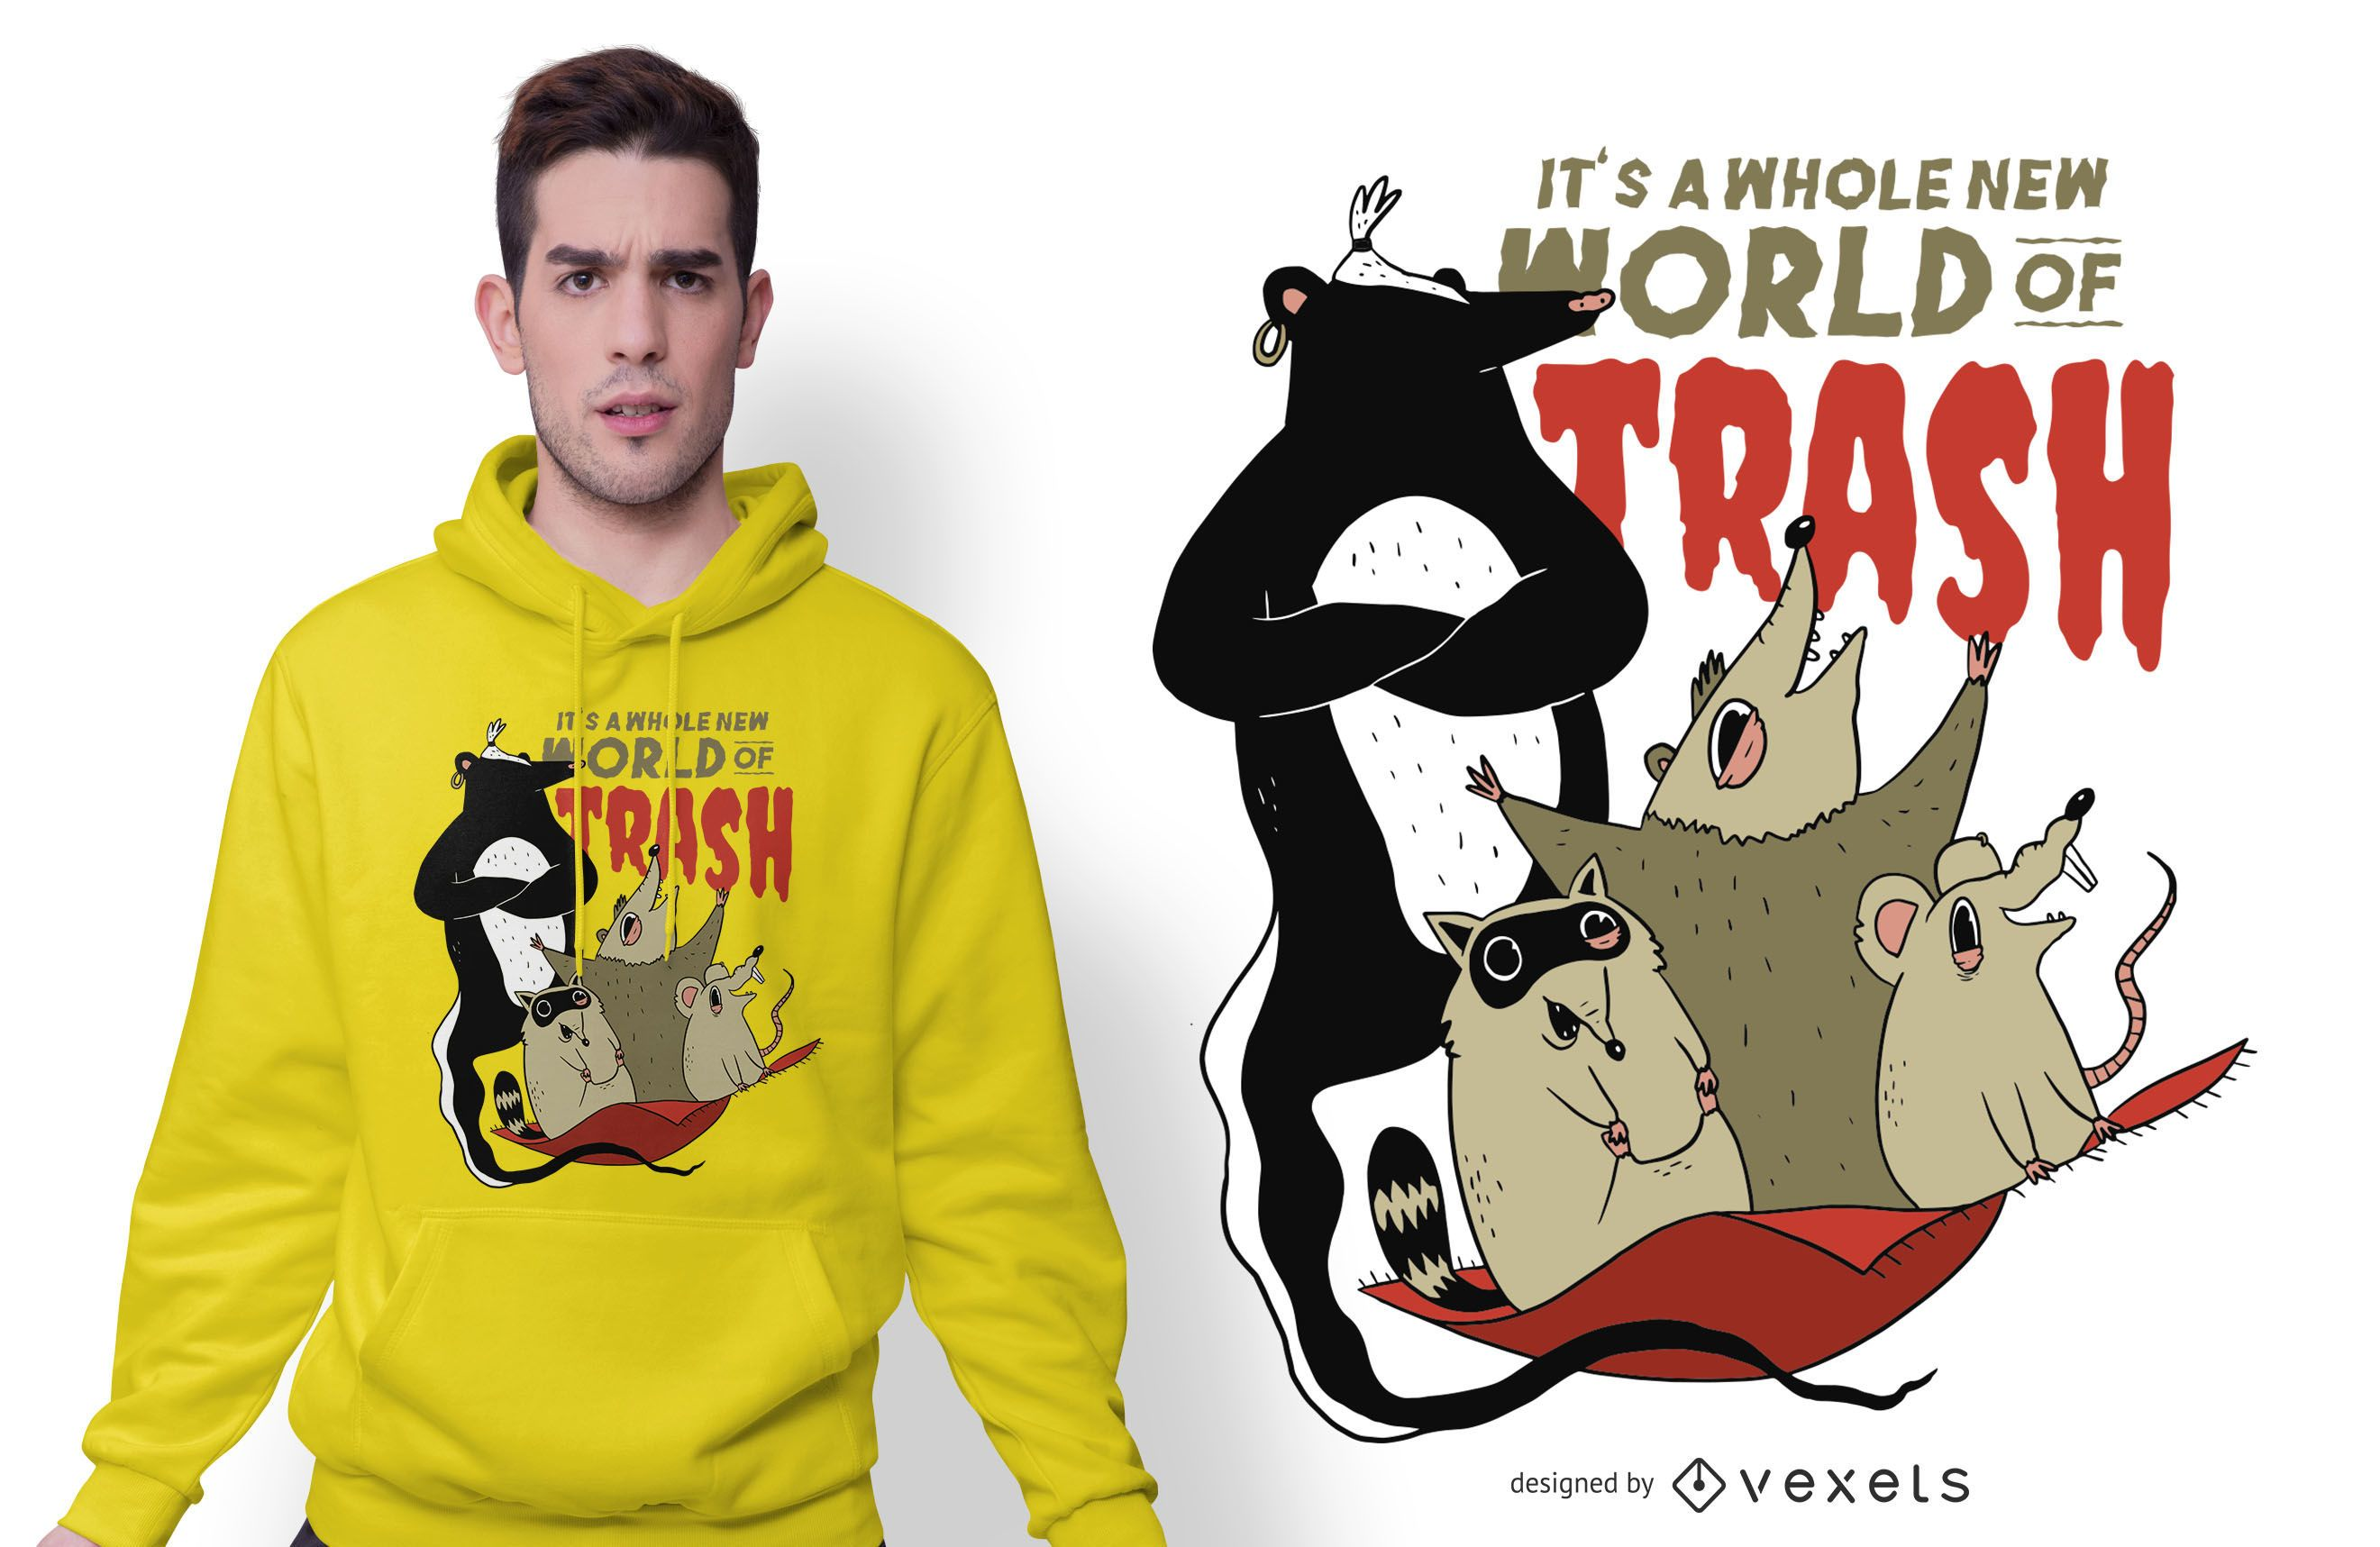 World Of Trash Funny T-shirt Design